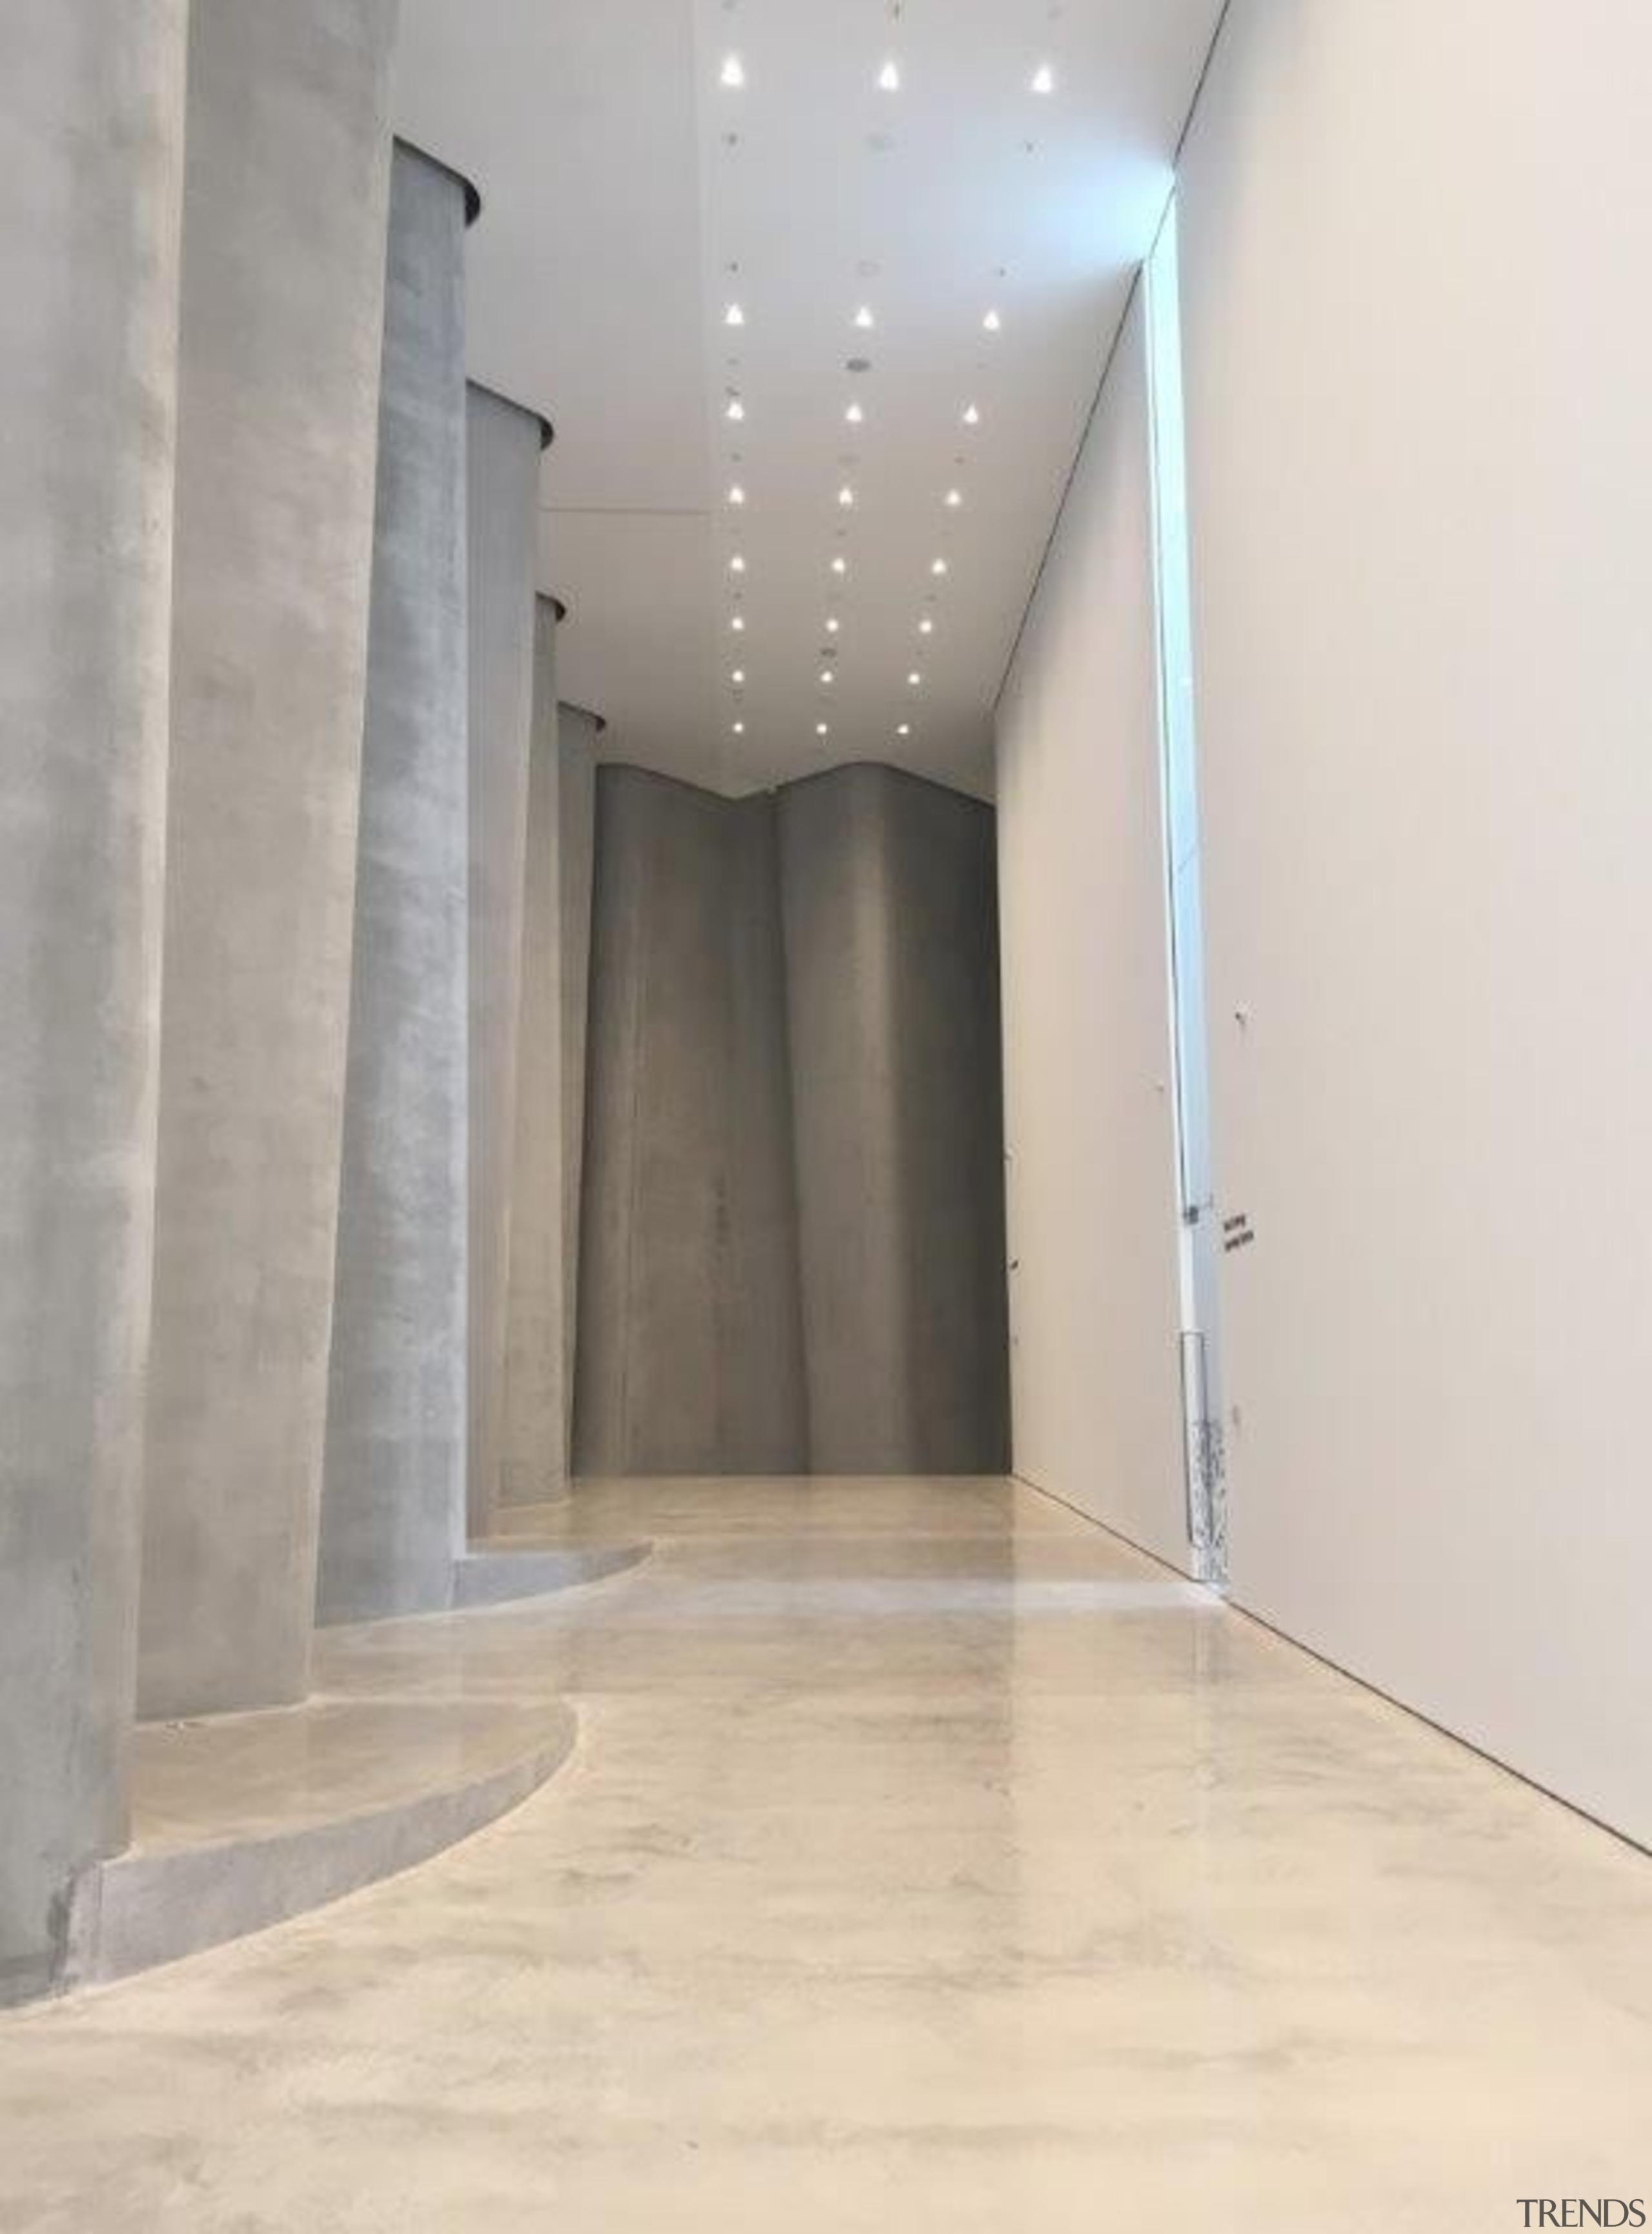 The Len Lye Centre 02 - The Len ceiling, daylighting, floor, flooring, interior design, lighting, property, wall, gray